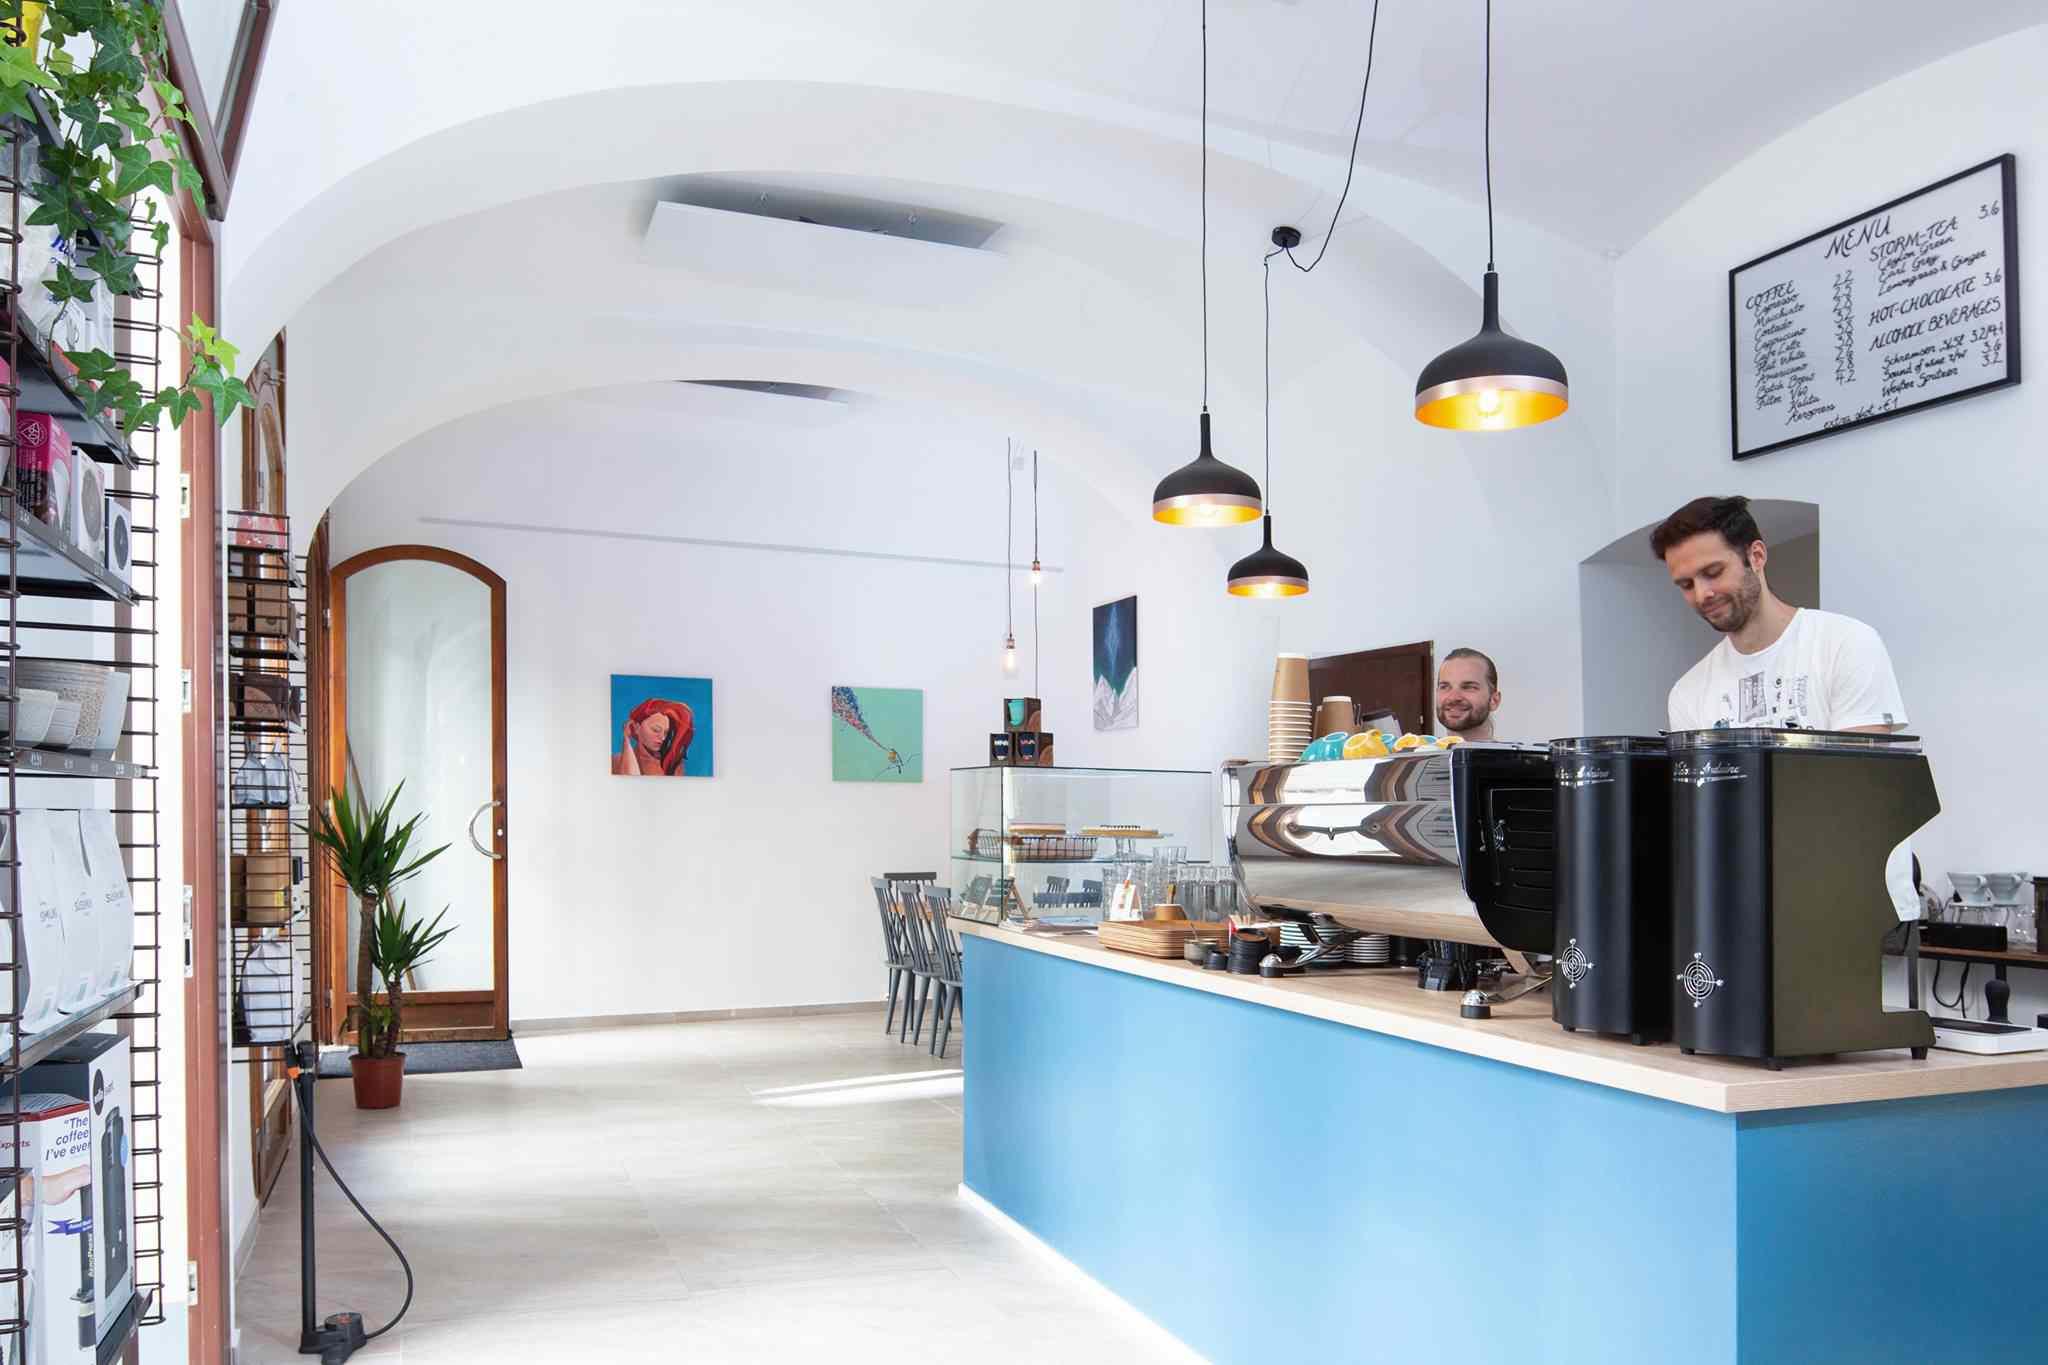 Inside the Pelican Coffee Company, Vienna